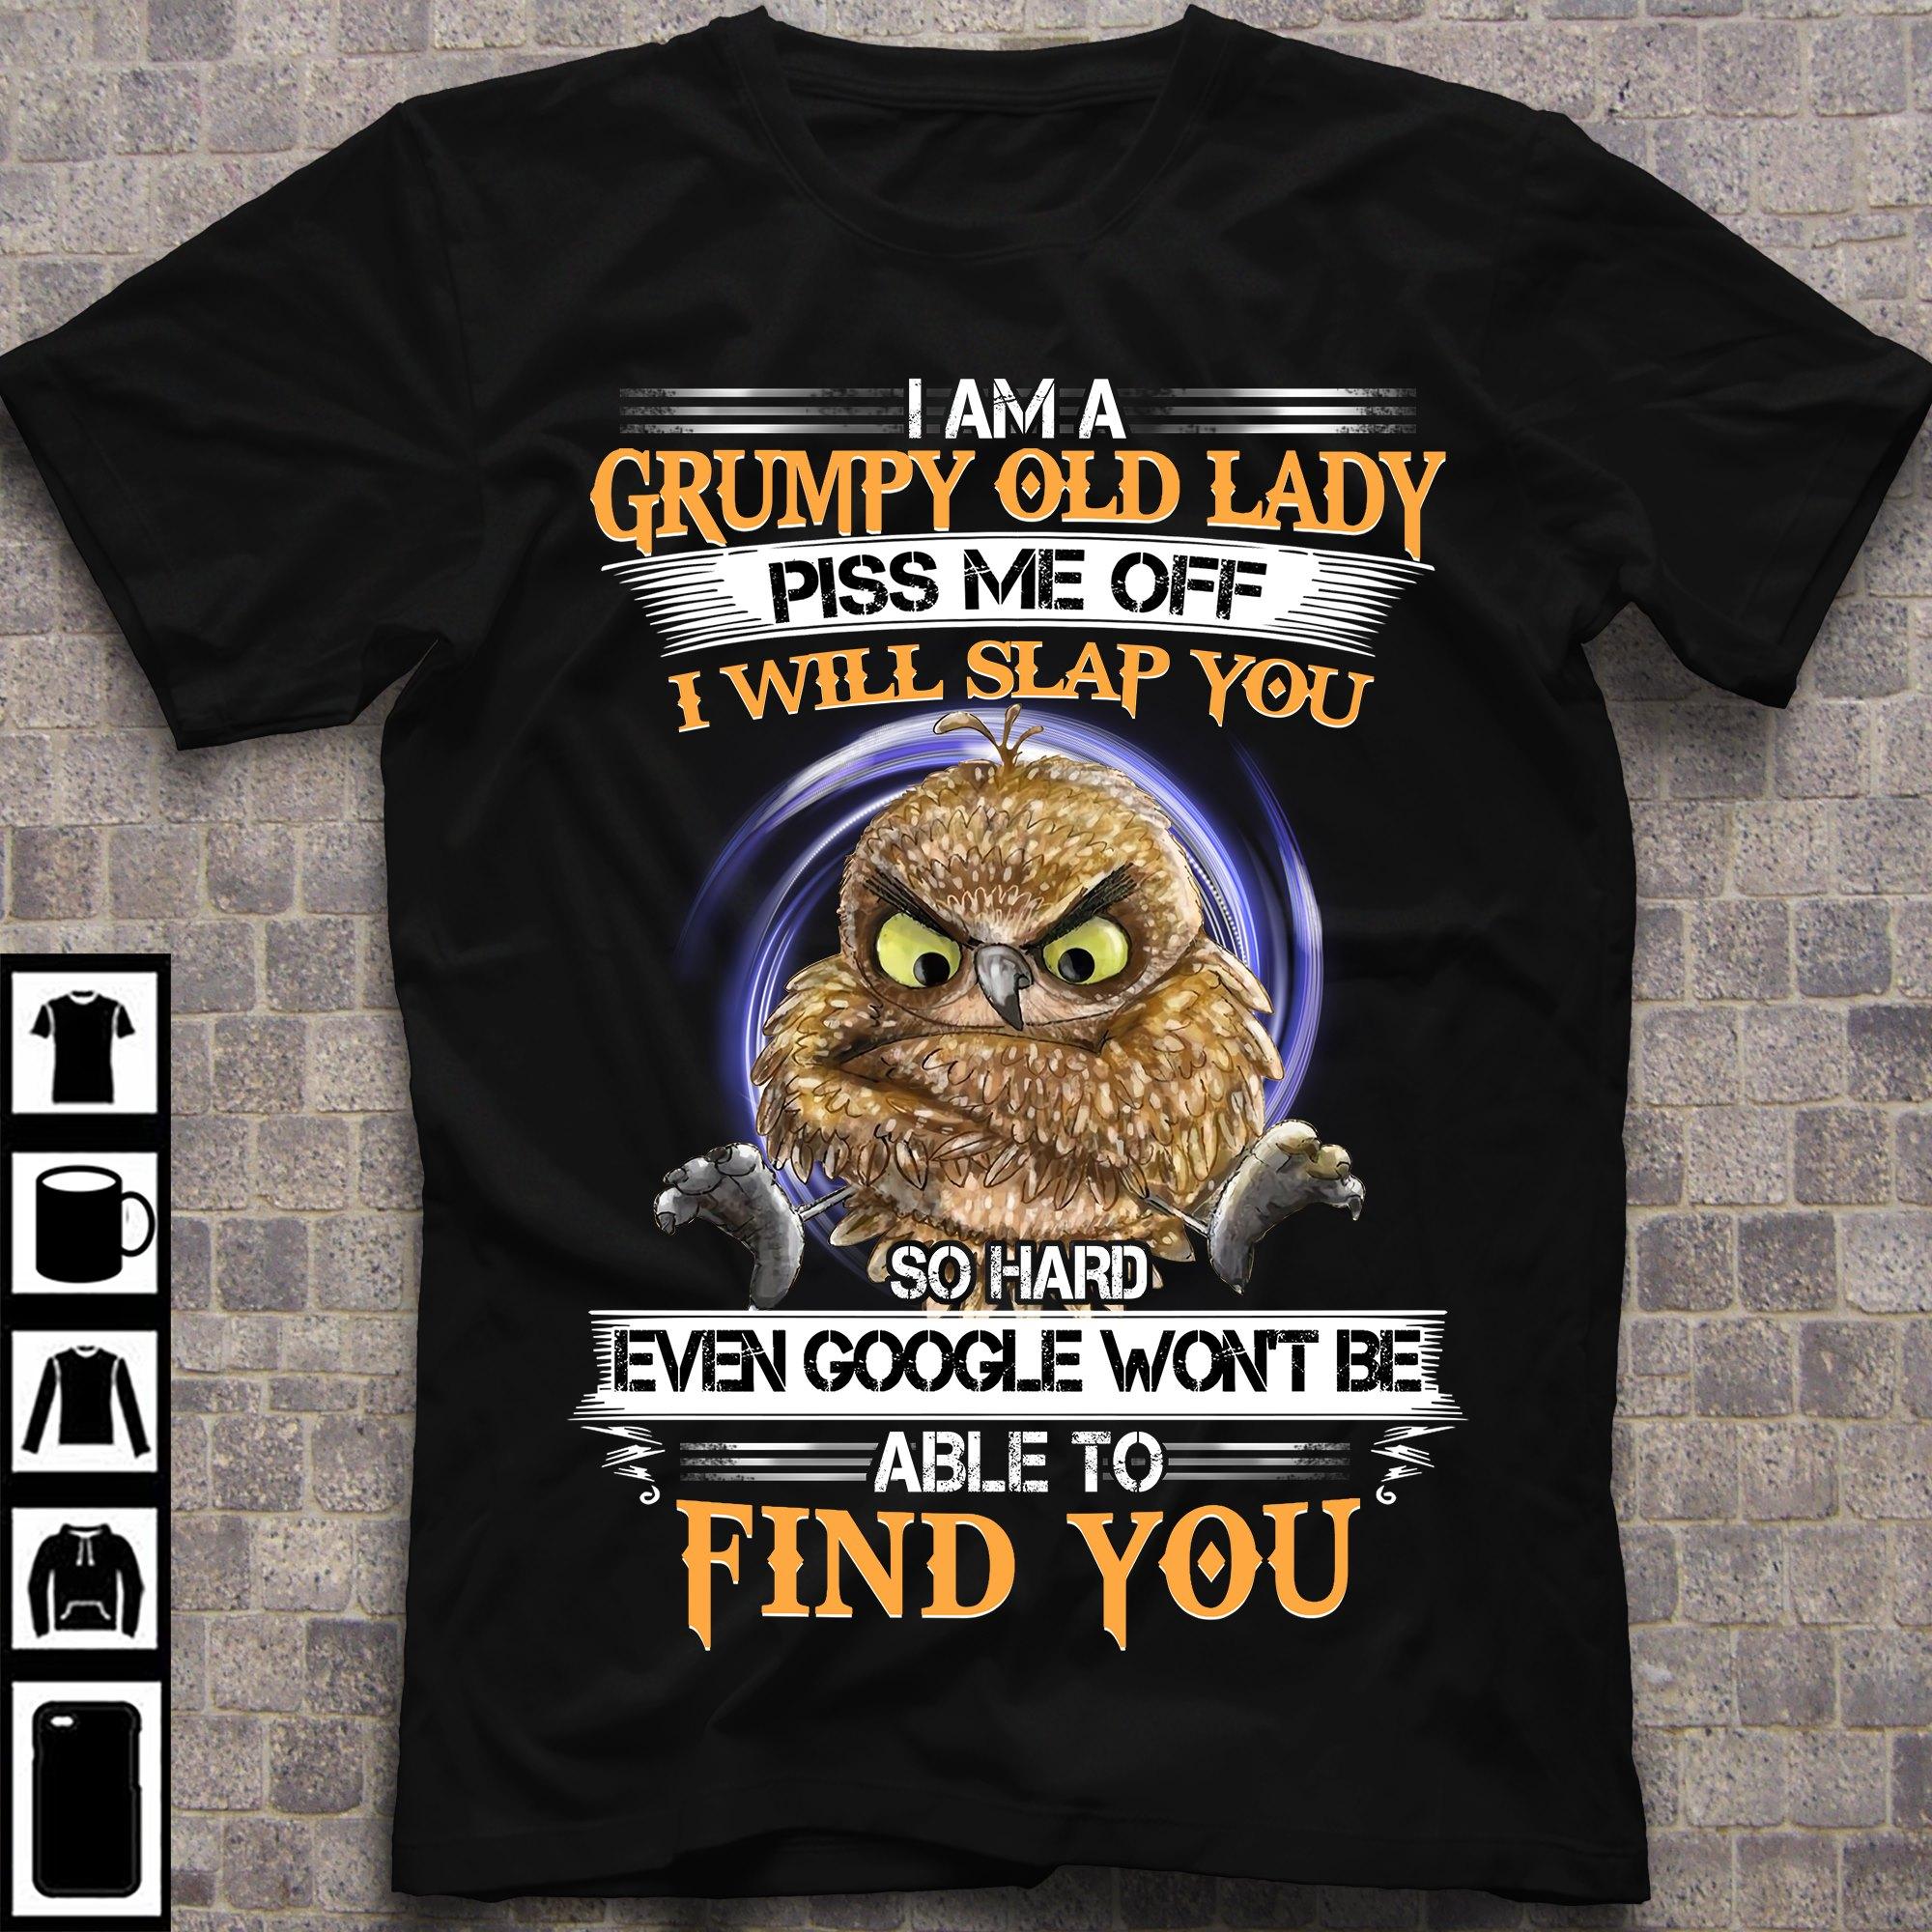 Grumpy Old Lady Shirt Owl Piss Me Off I Will Slap You So Hard